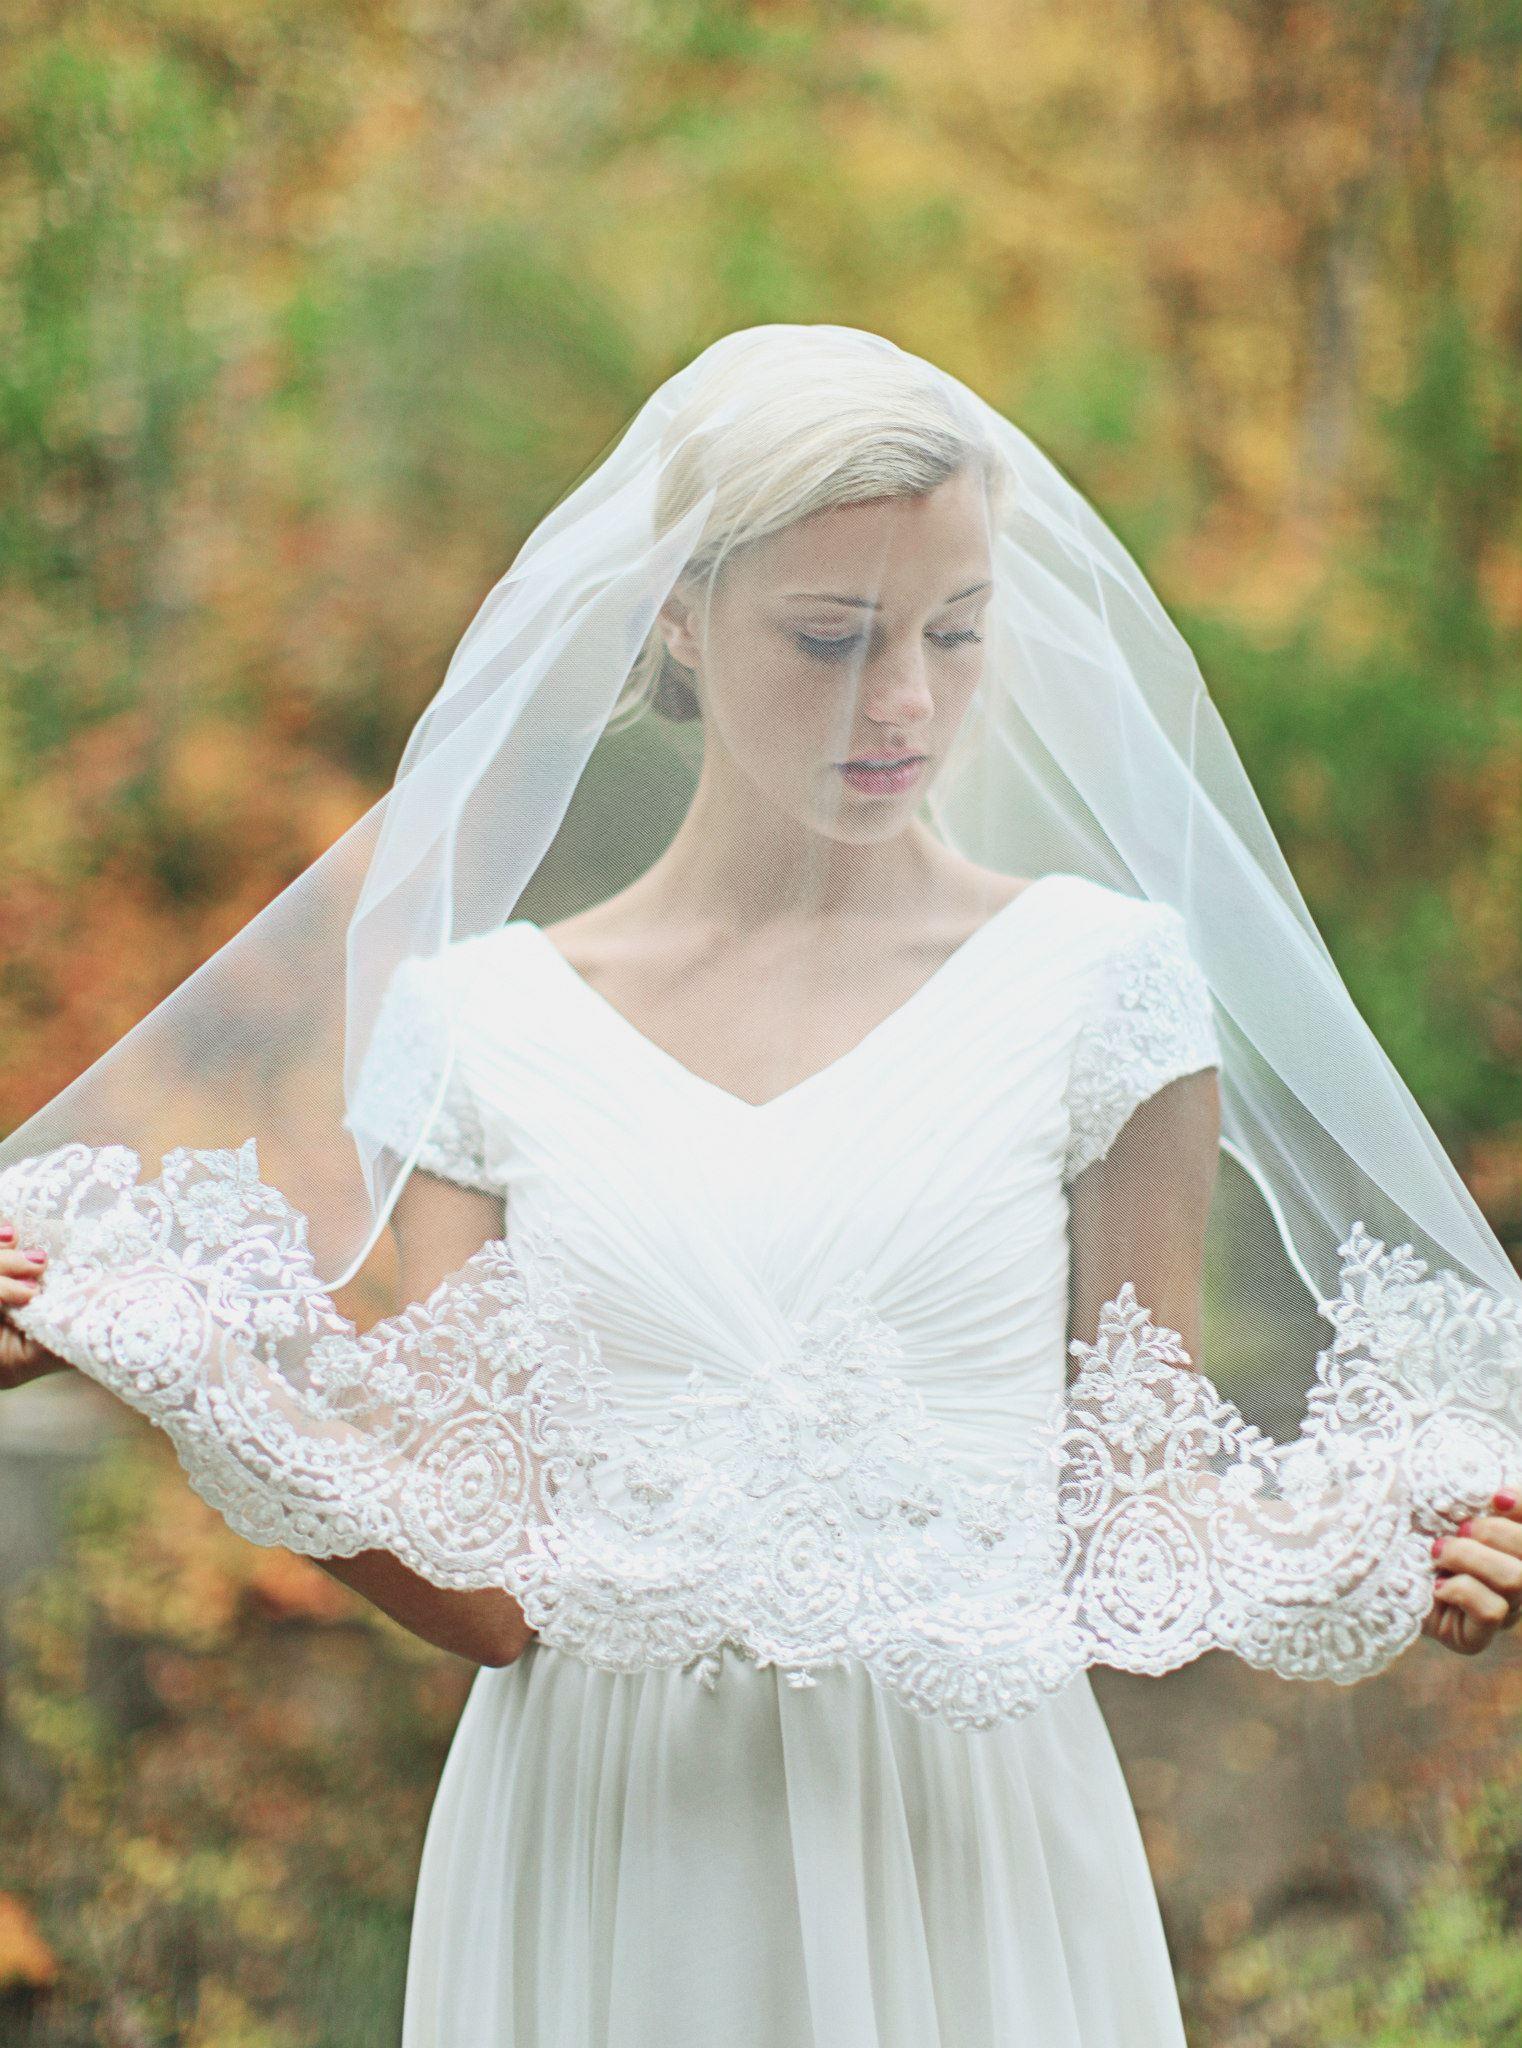 modest wedding dress veil chiffon LDS wedding dress | The Big Day ...